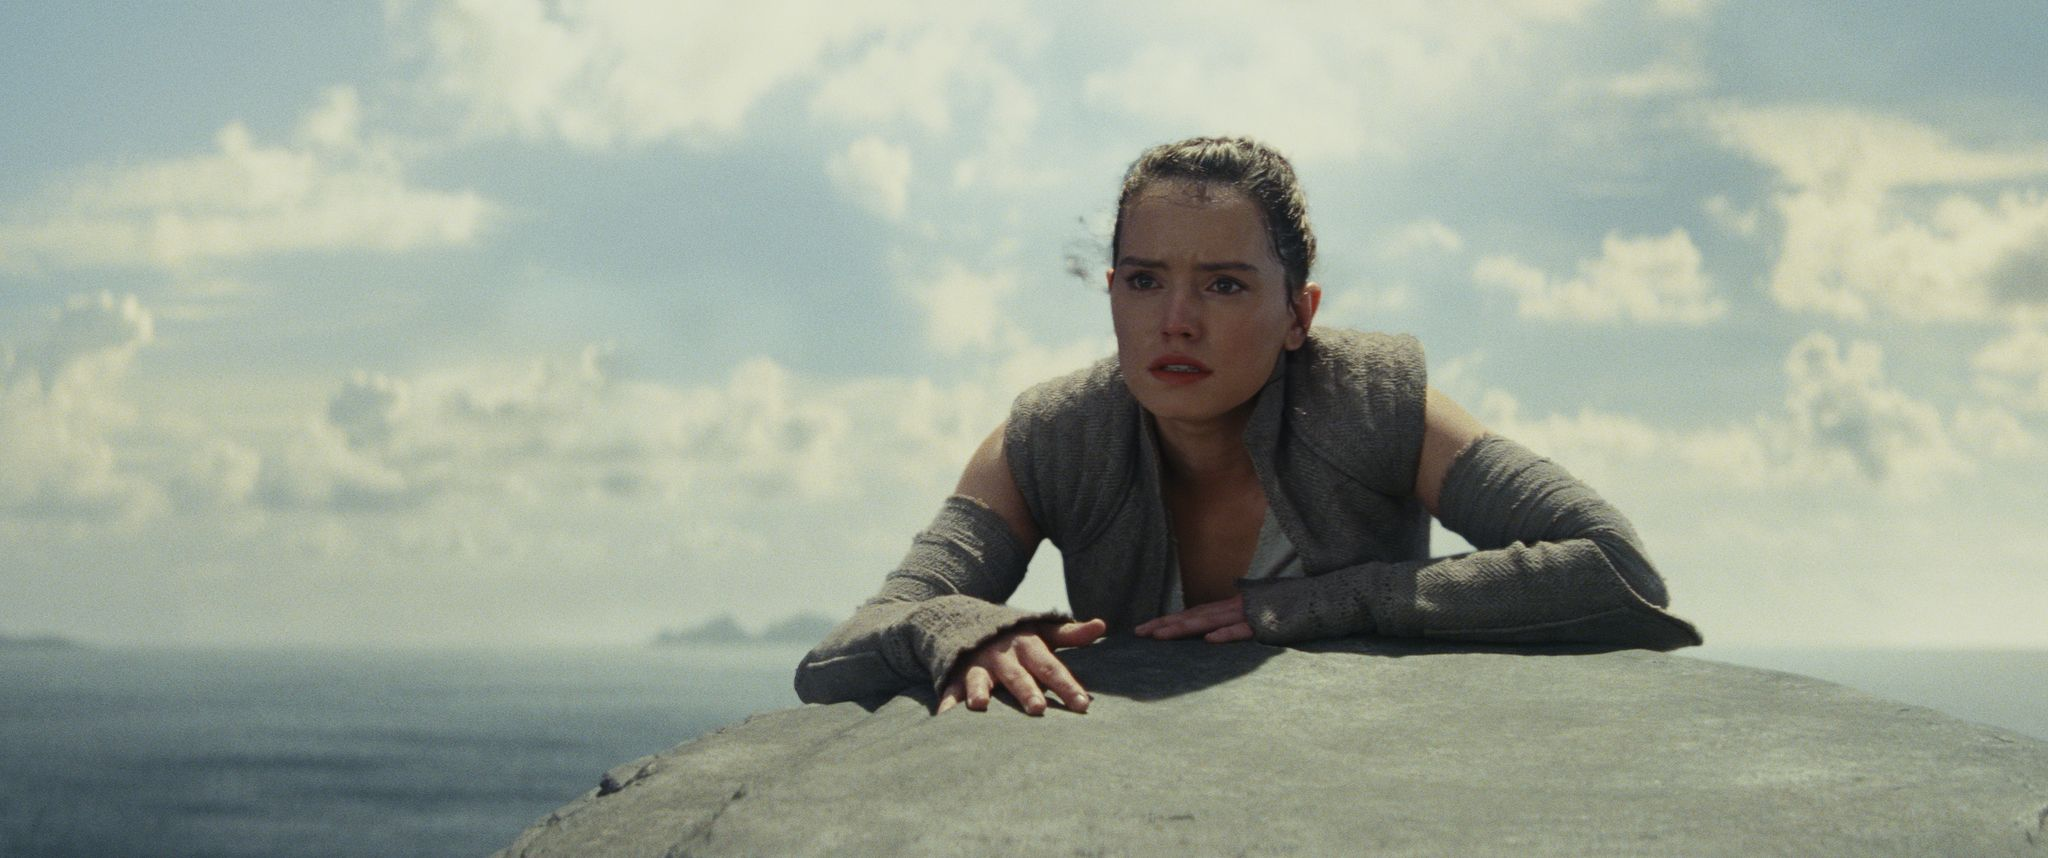 Movie Talk: After 'Episode IX' Where Does 'Star Wars' Go Next?